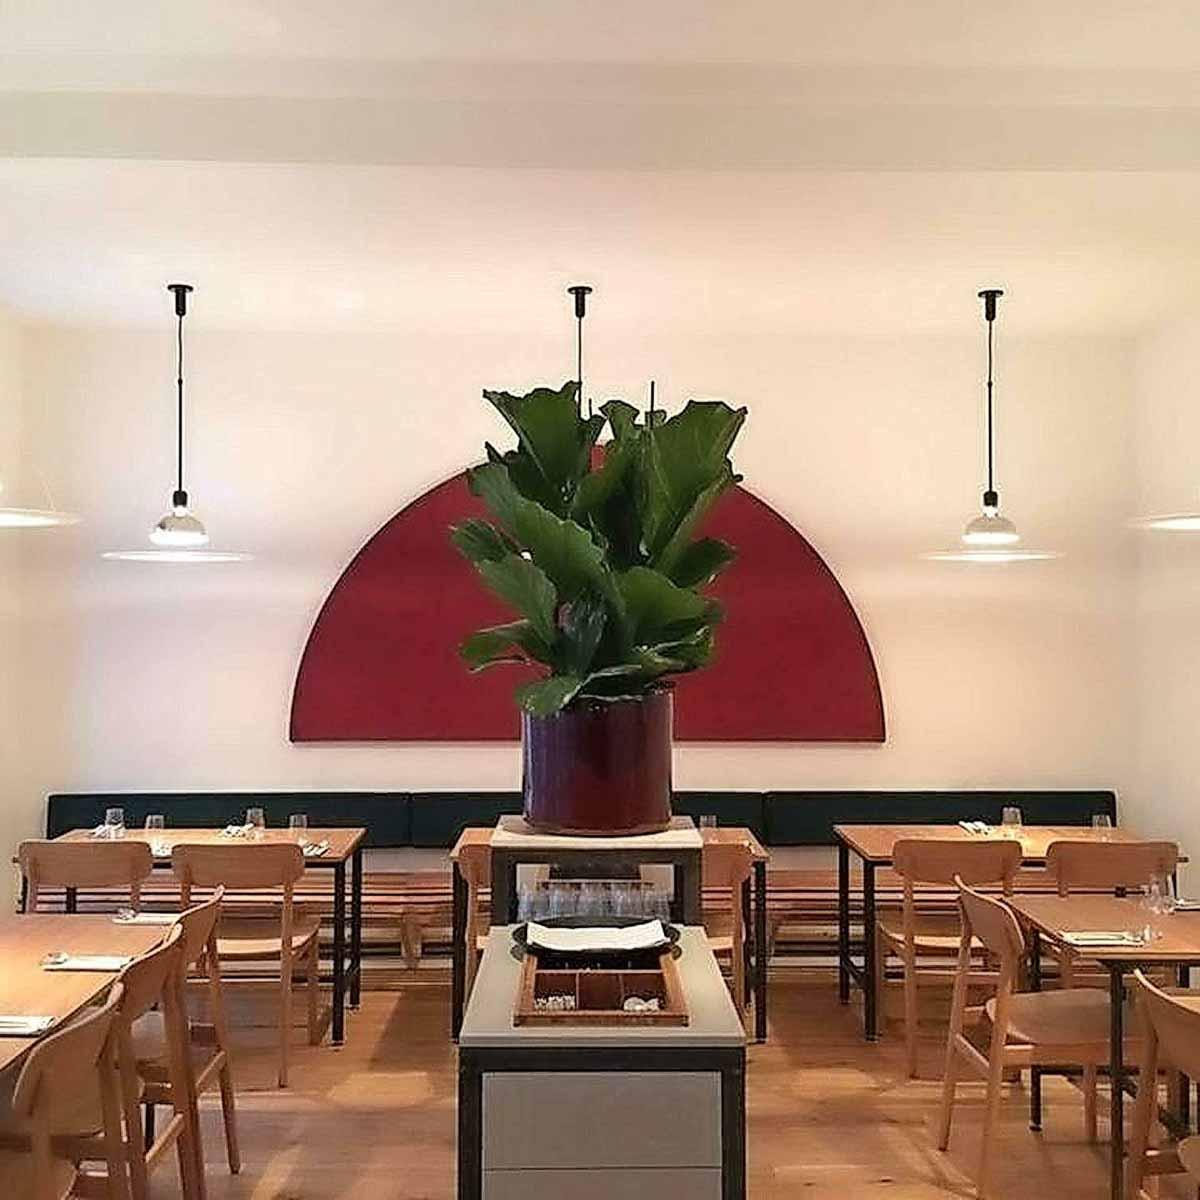 Restaurant Lode & Stijn in Berlin-Kreuzberg